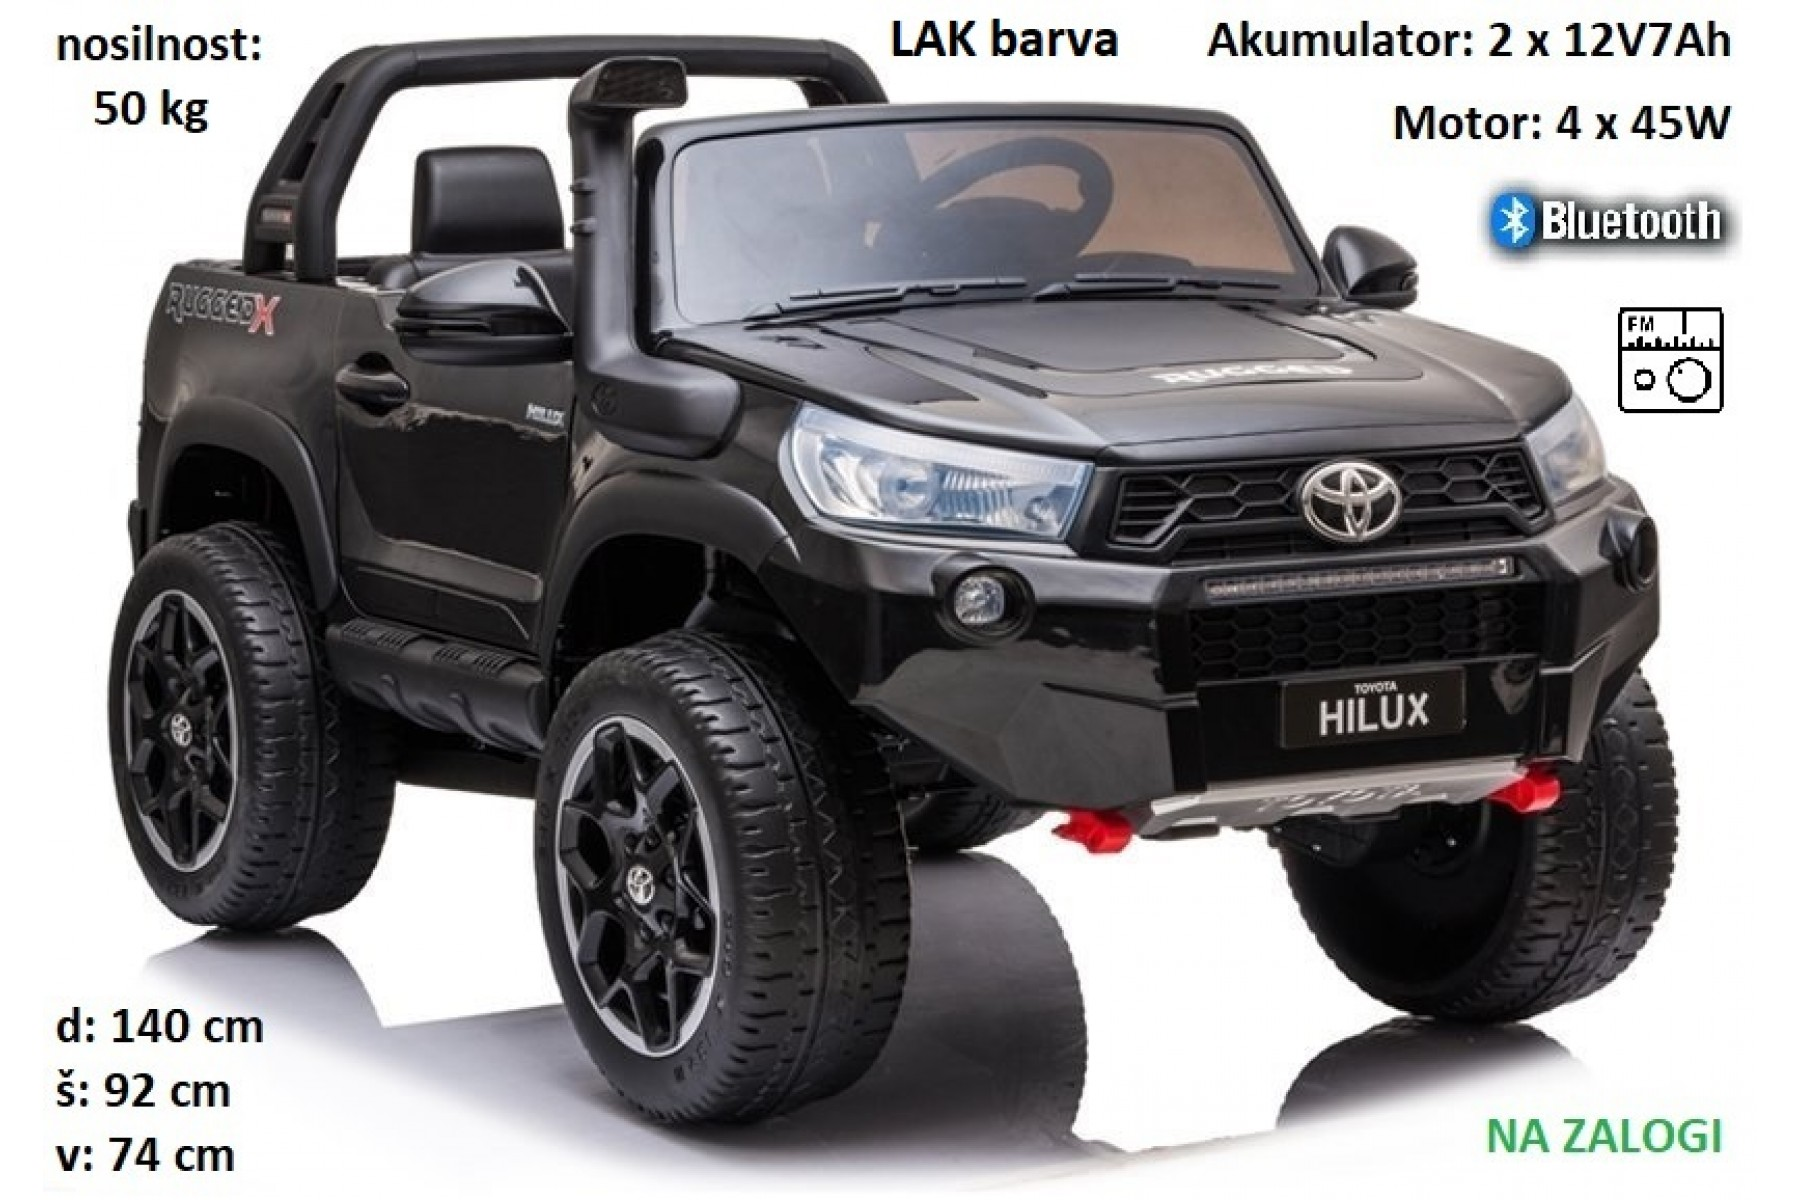 Toyota Hilux dvosed 24V, 4x4, LAK